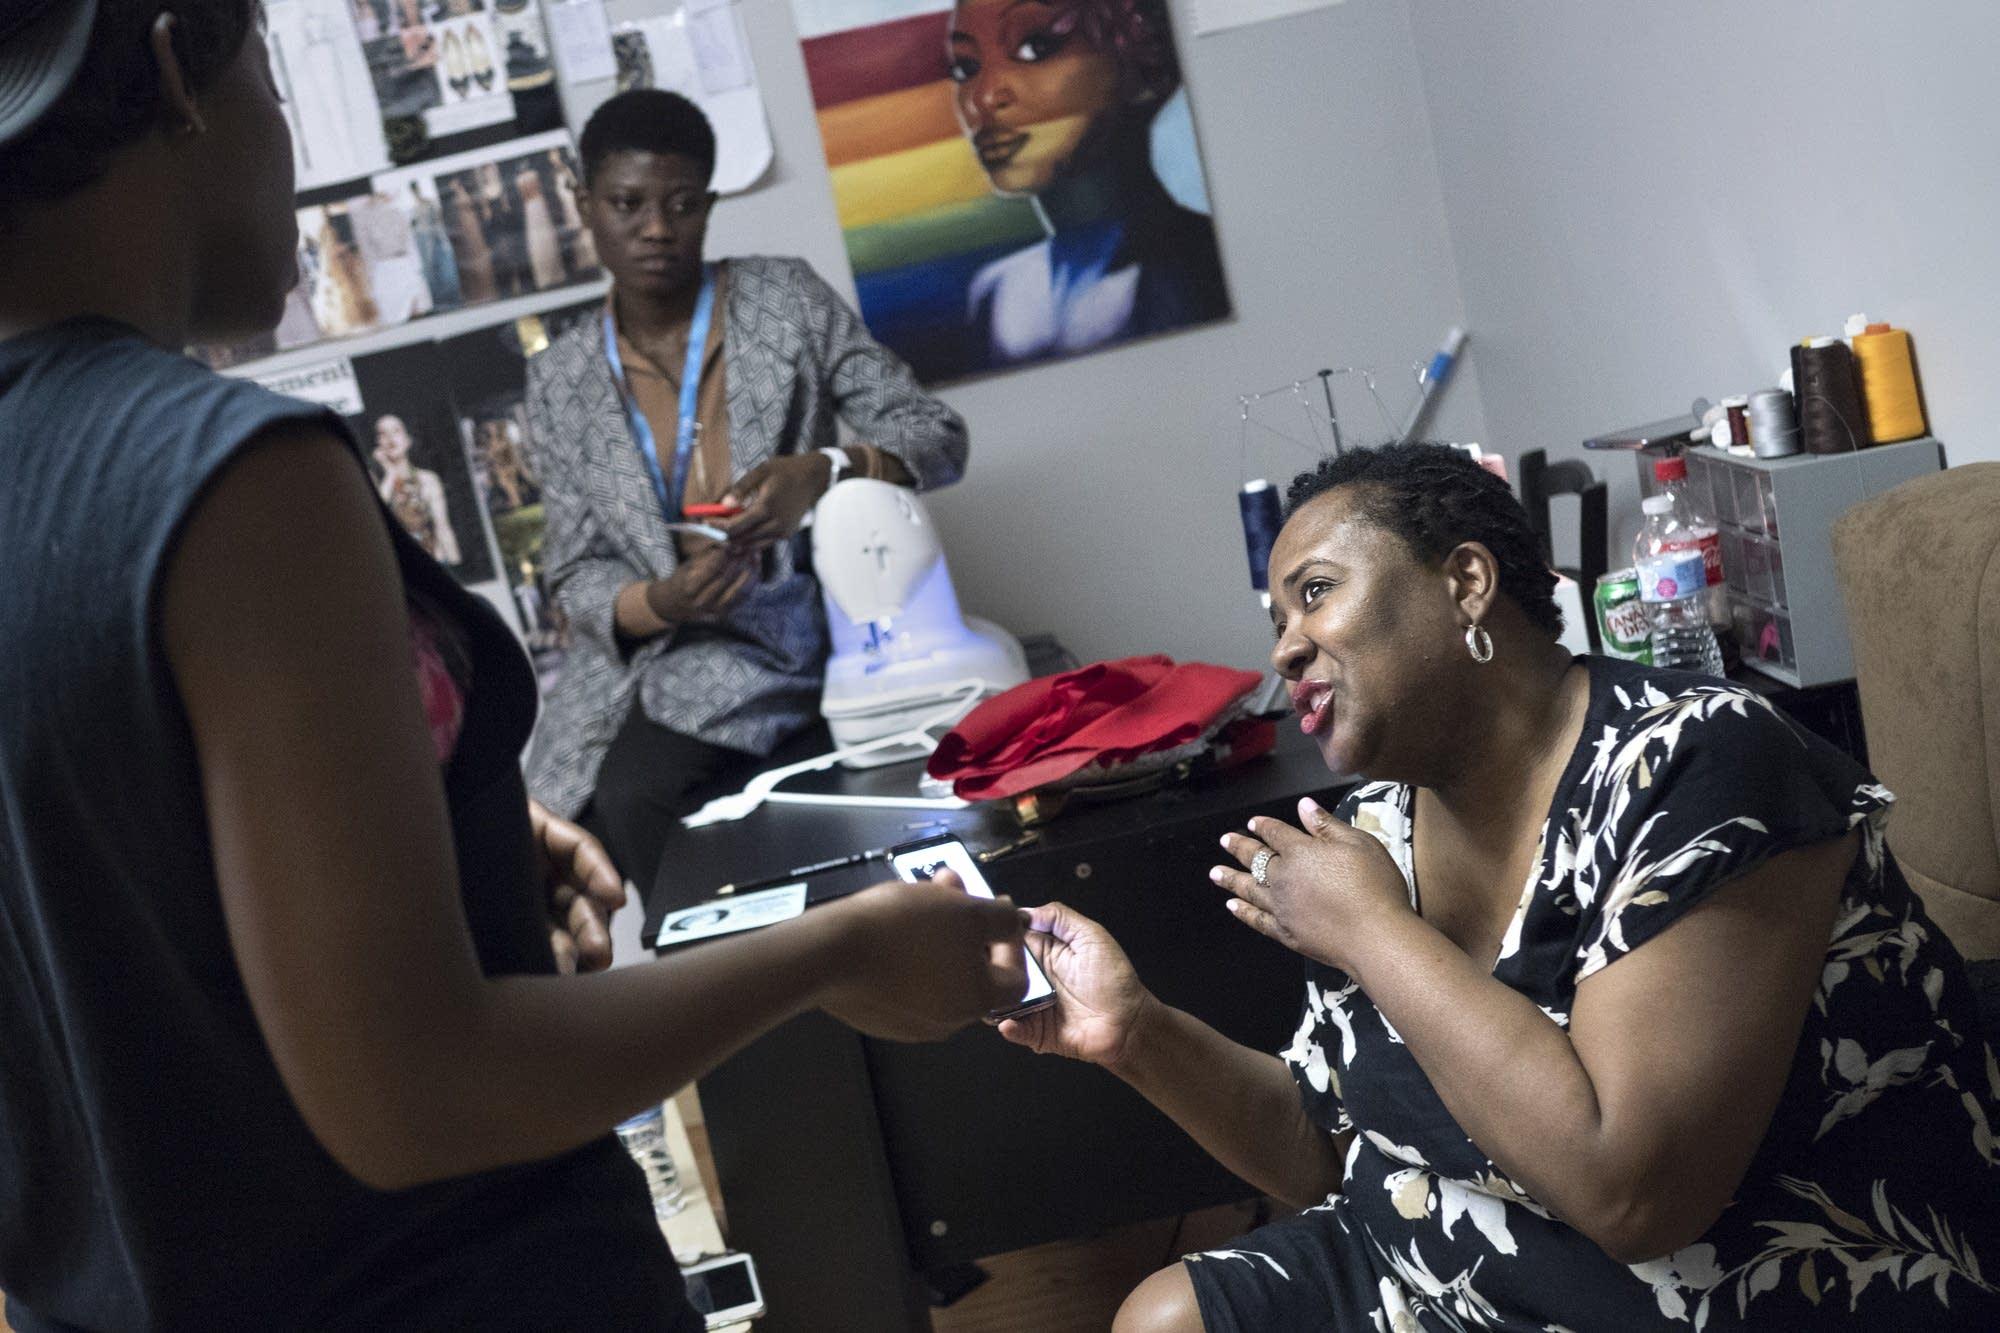 Black Fashion Week founder Natalie Morrow talks with Jacqueline Addison.